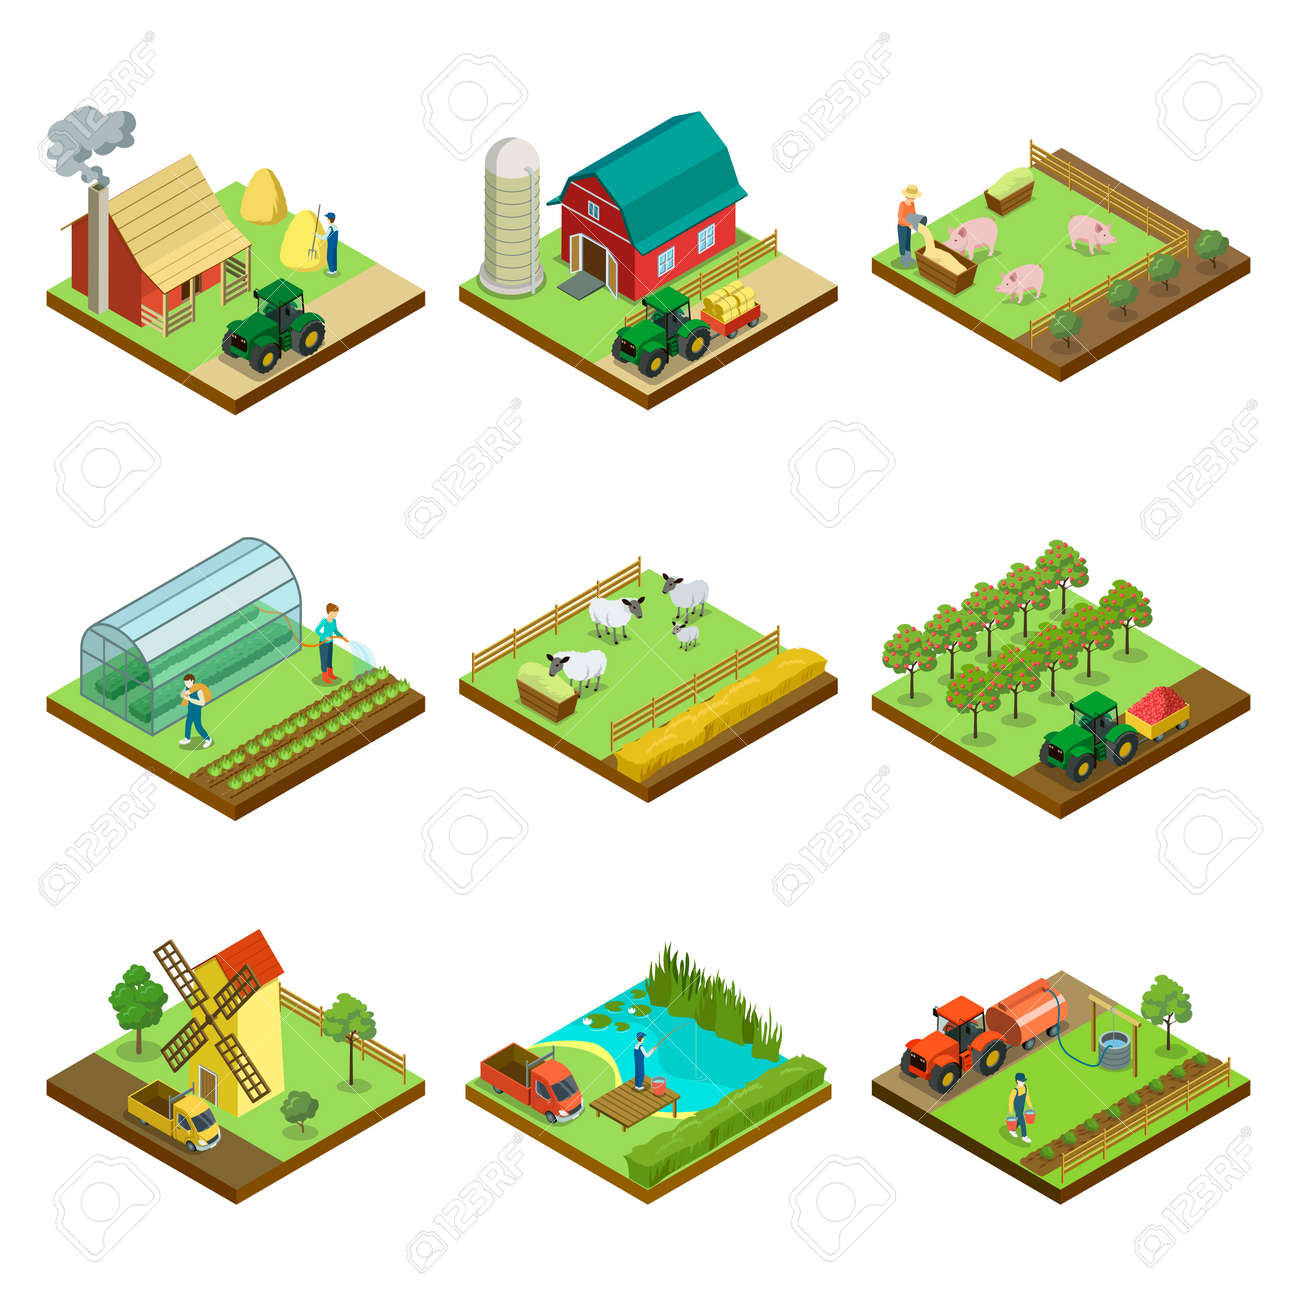 Natural farming isometric 3D elements - 113332835